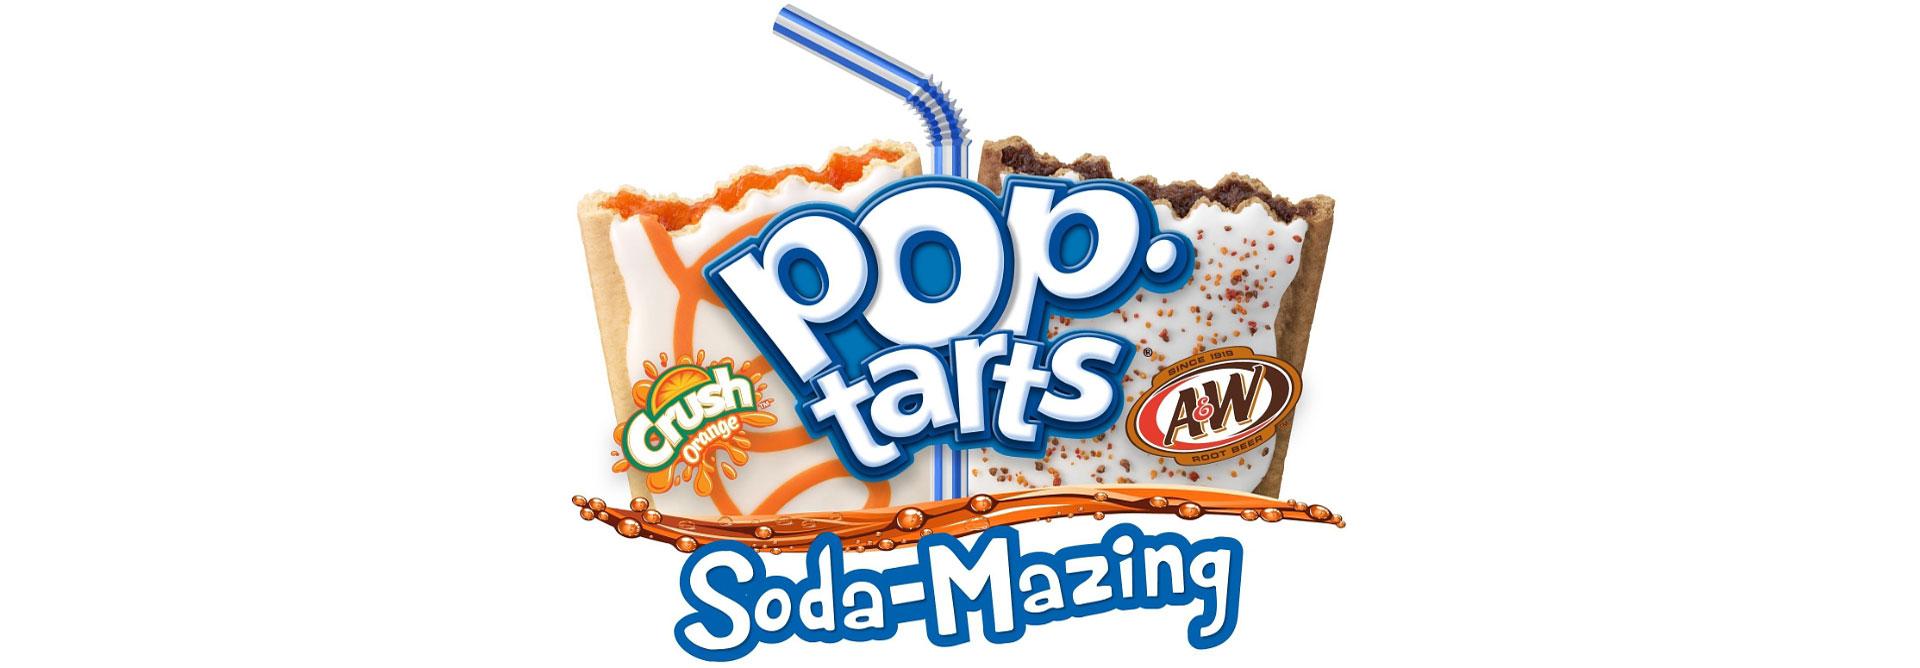 Kellogg's Pop Tarts A&W Root Beer Orange Crush